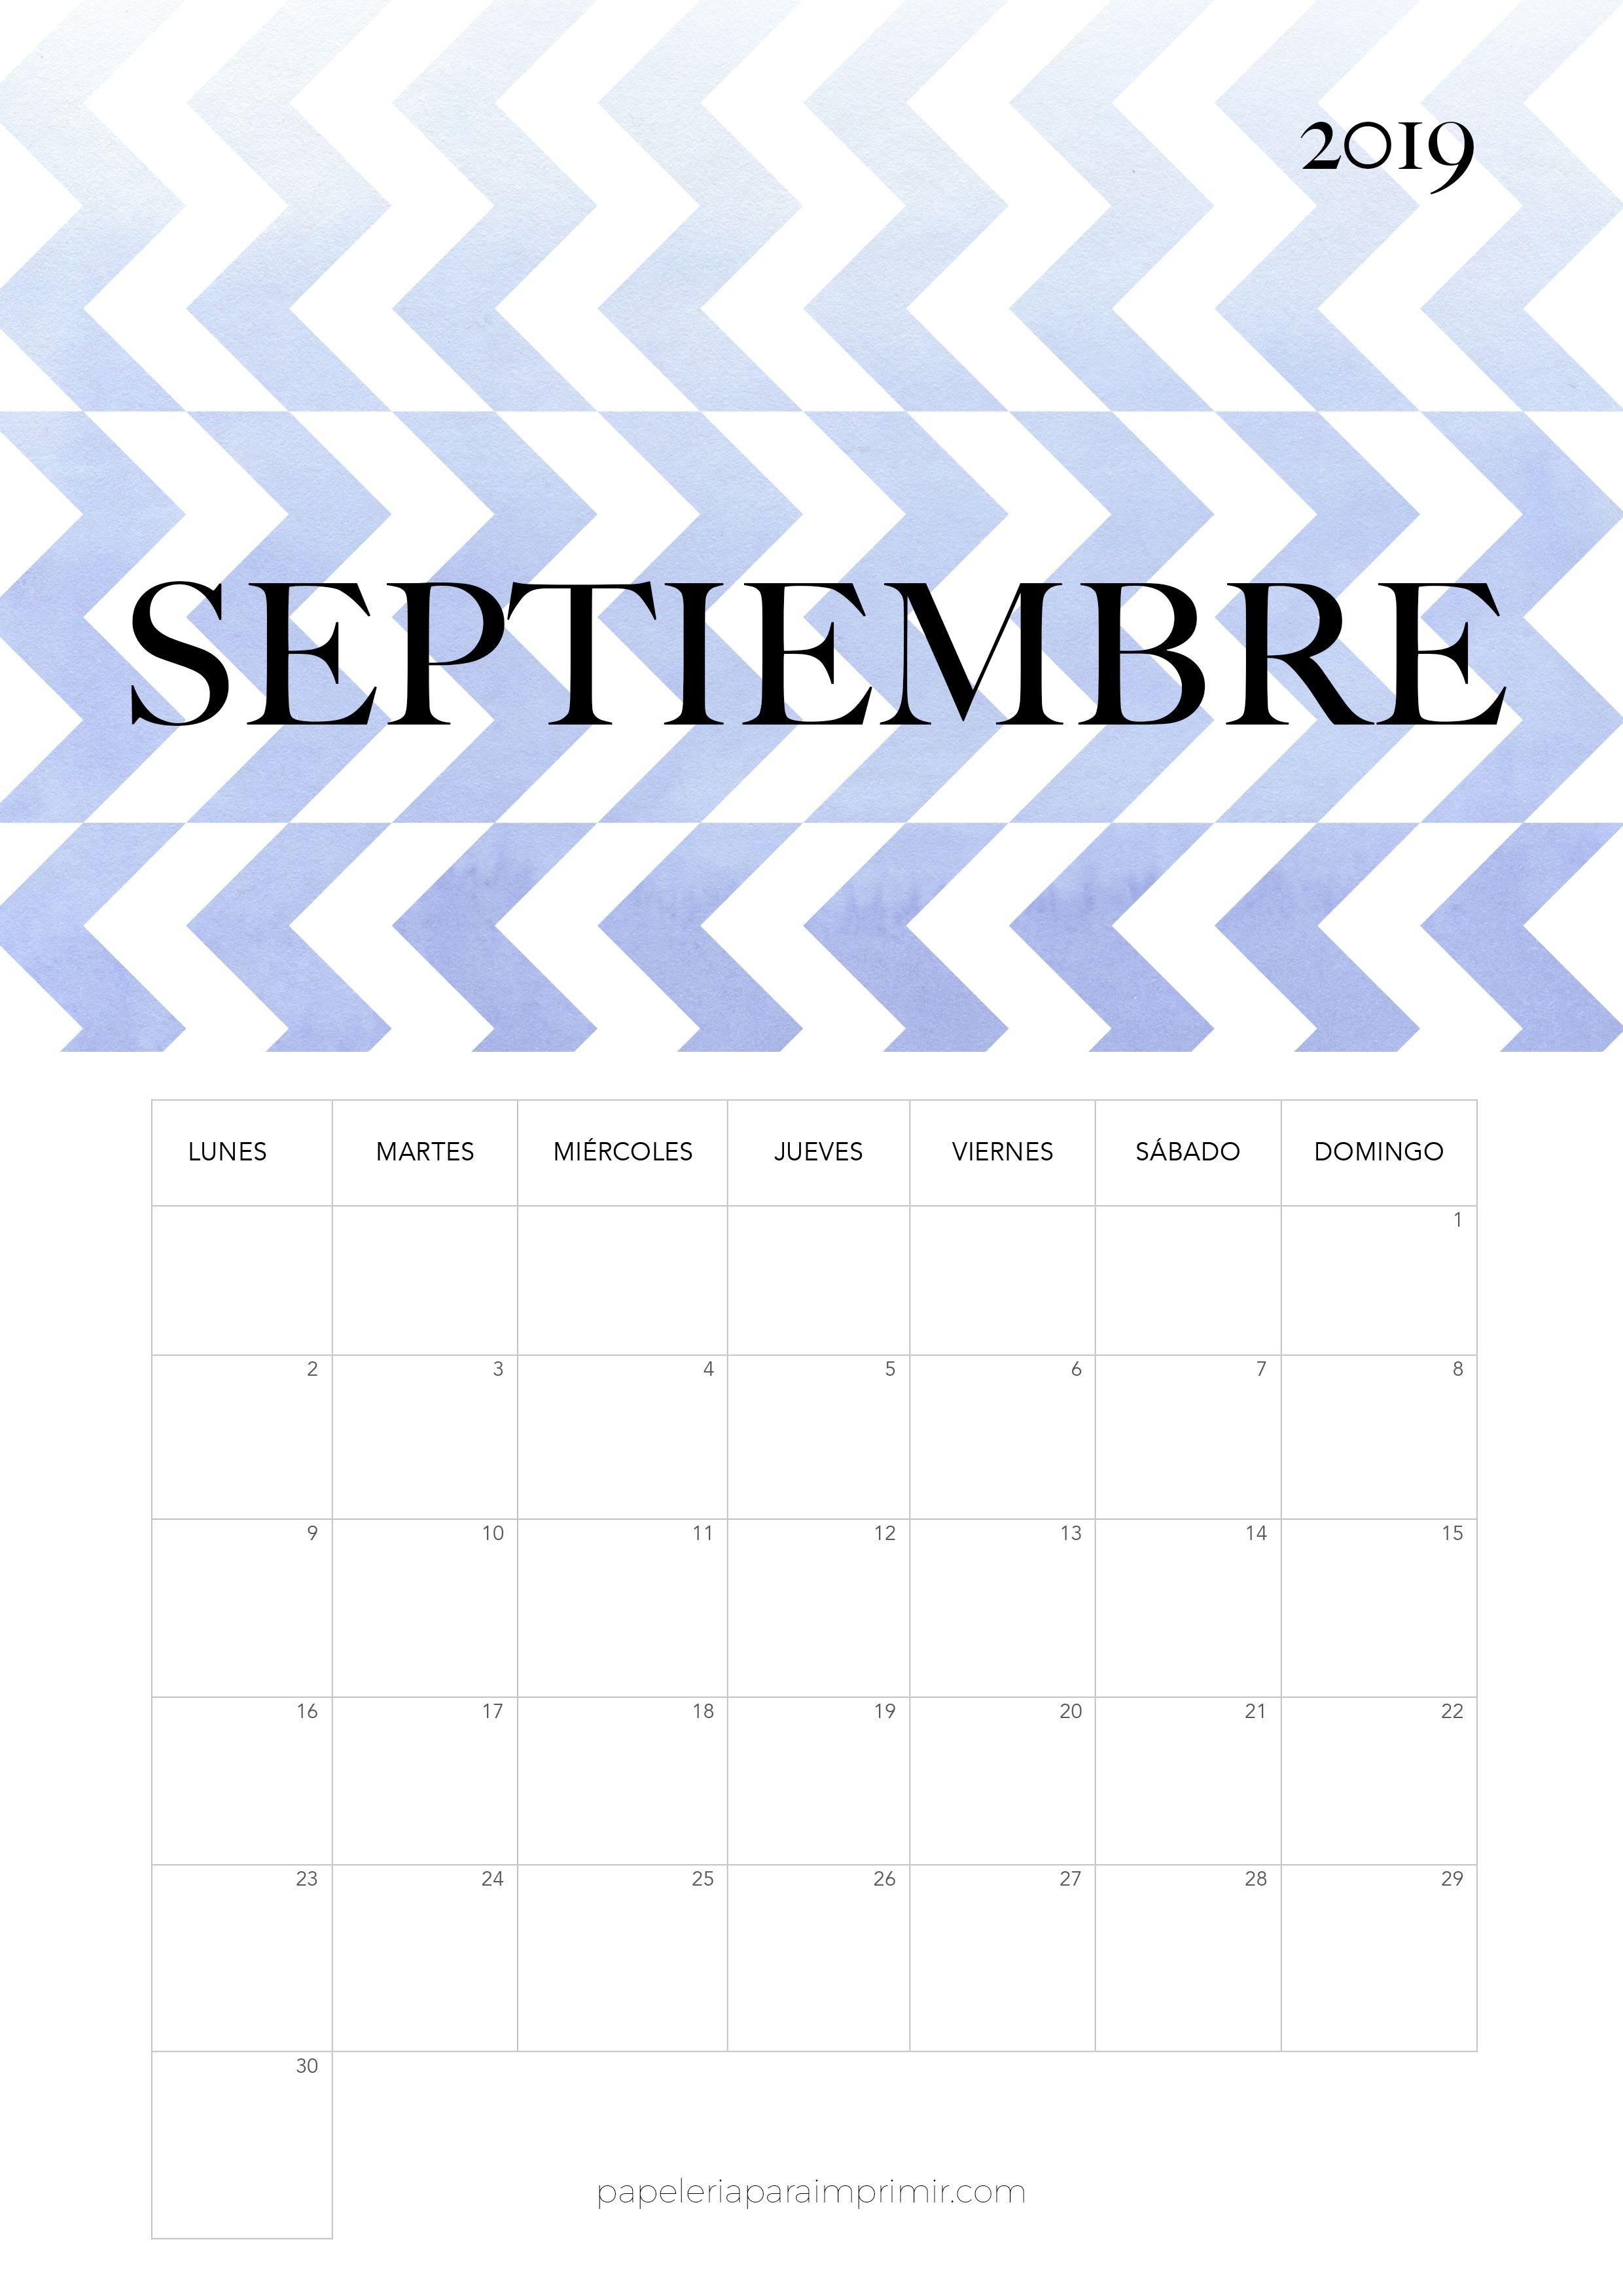 Calendario Imprimir 2017 Meses Más Recientemente Liberado Pin De Aeuniceva En Imprimibles Portadas De Agendas